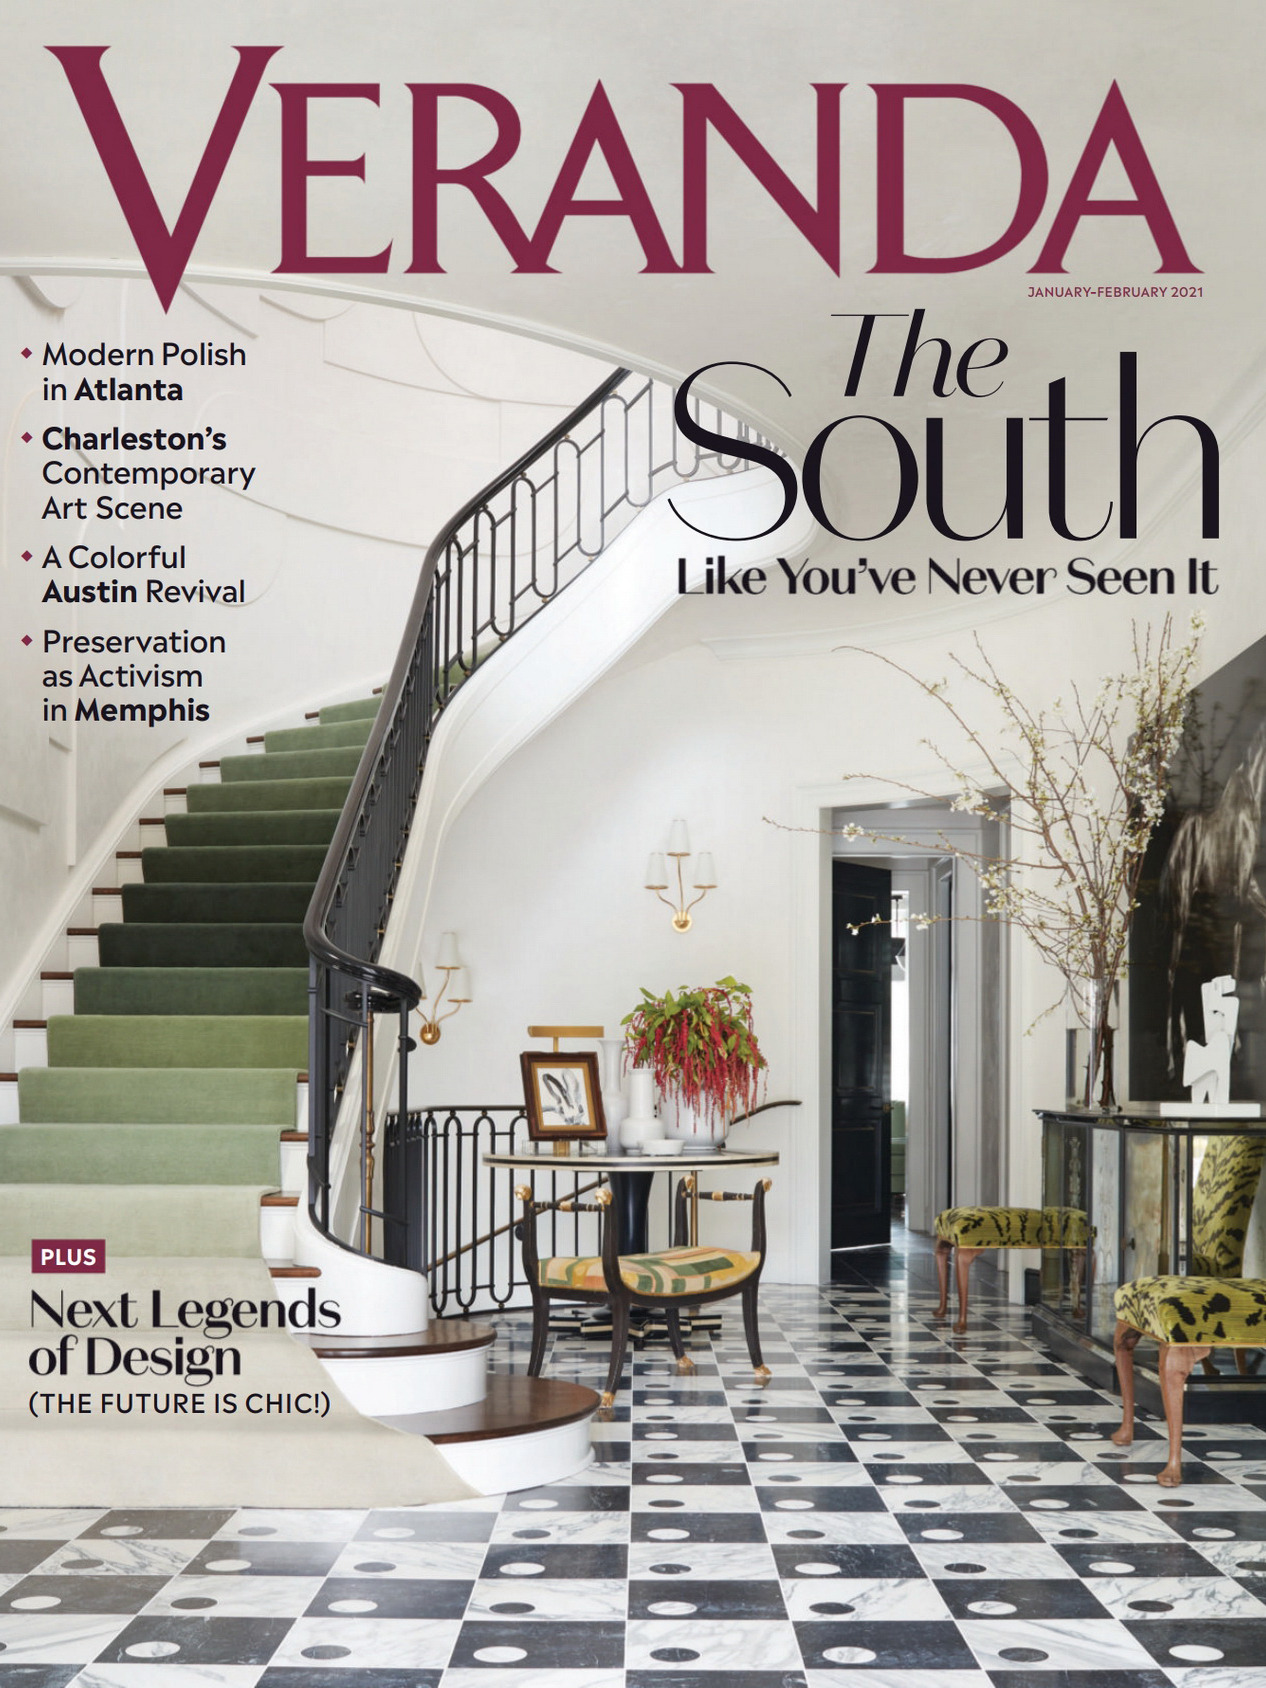 《VERANDA》美国家纺杂志2021年01-02月号